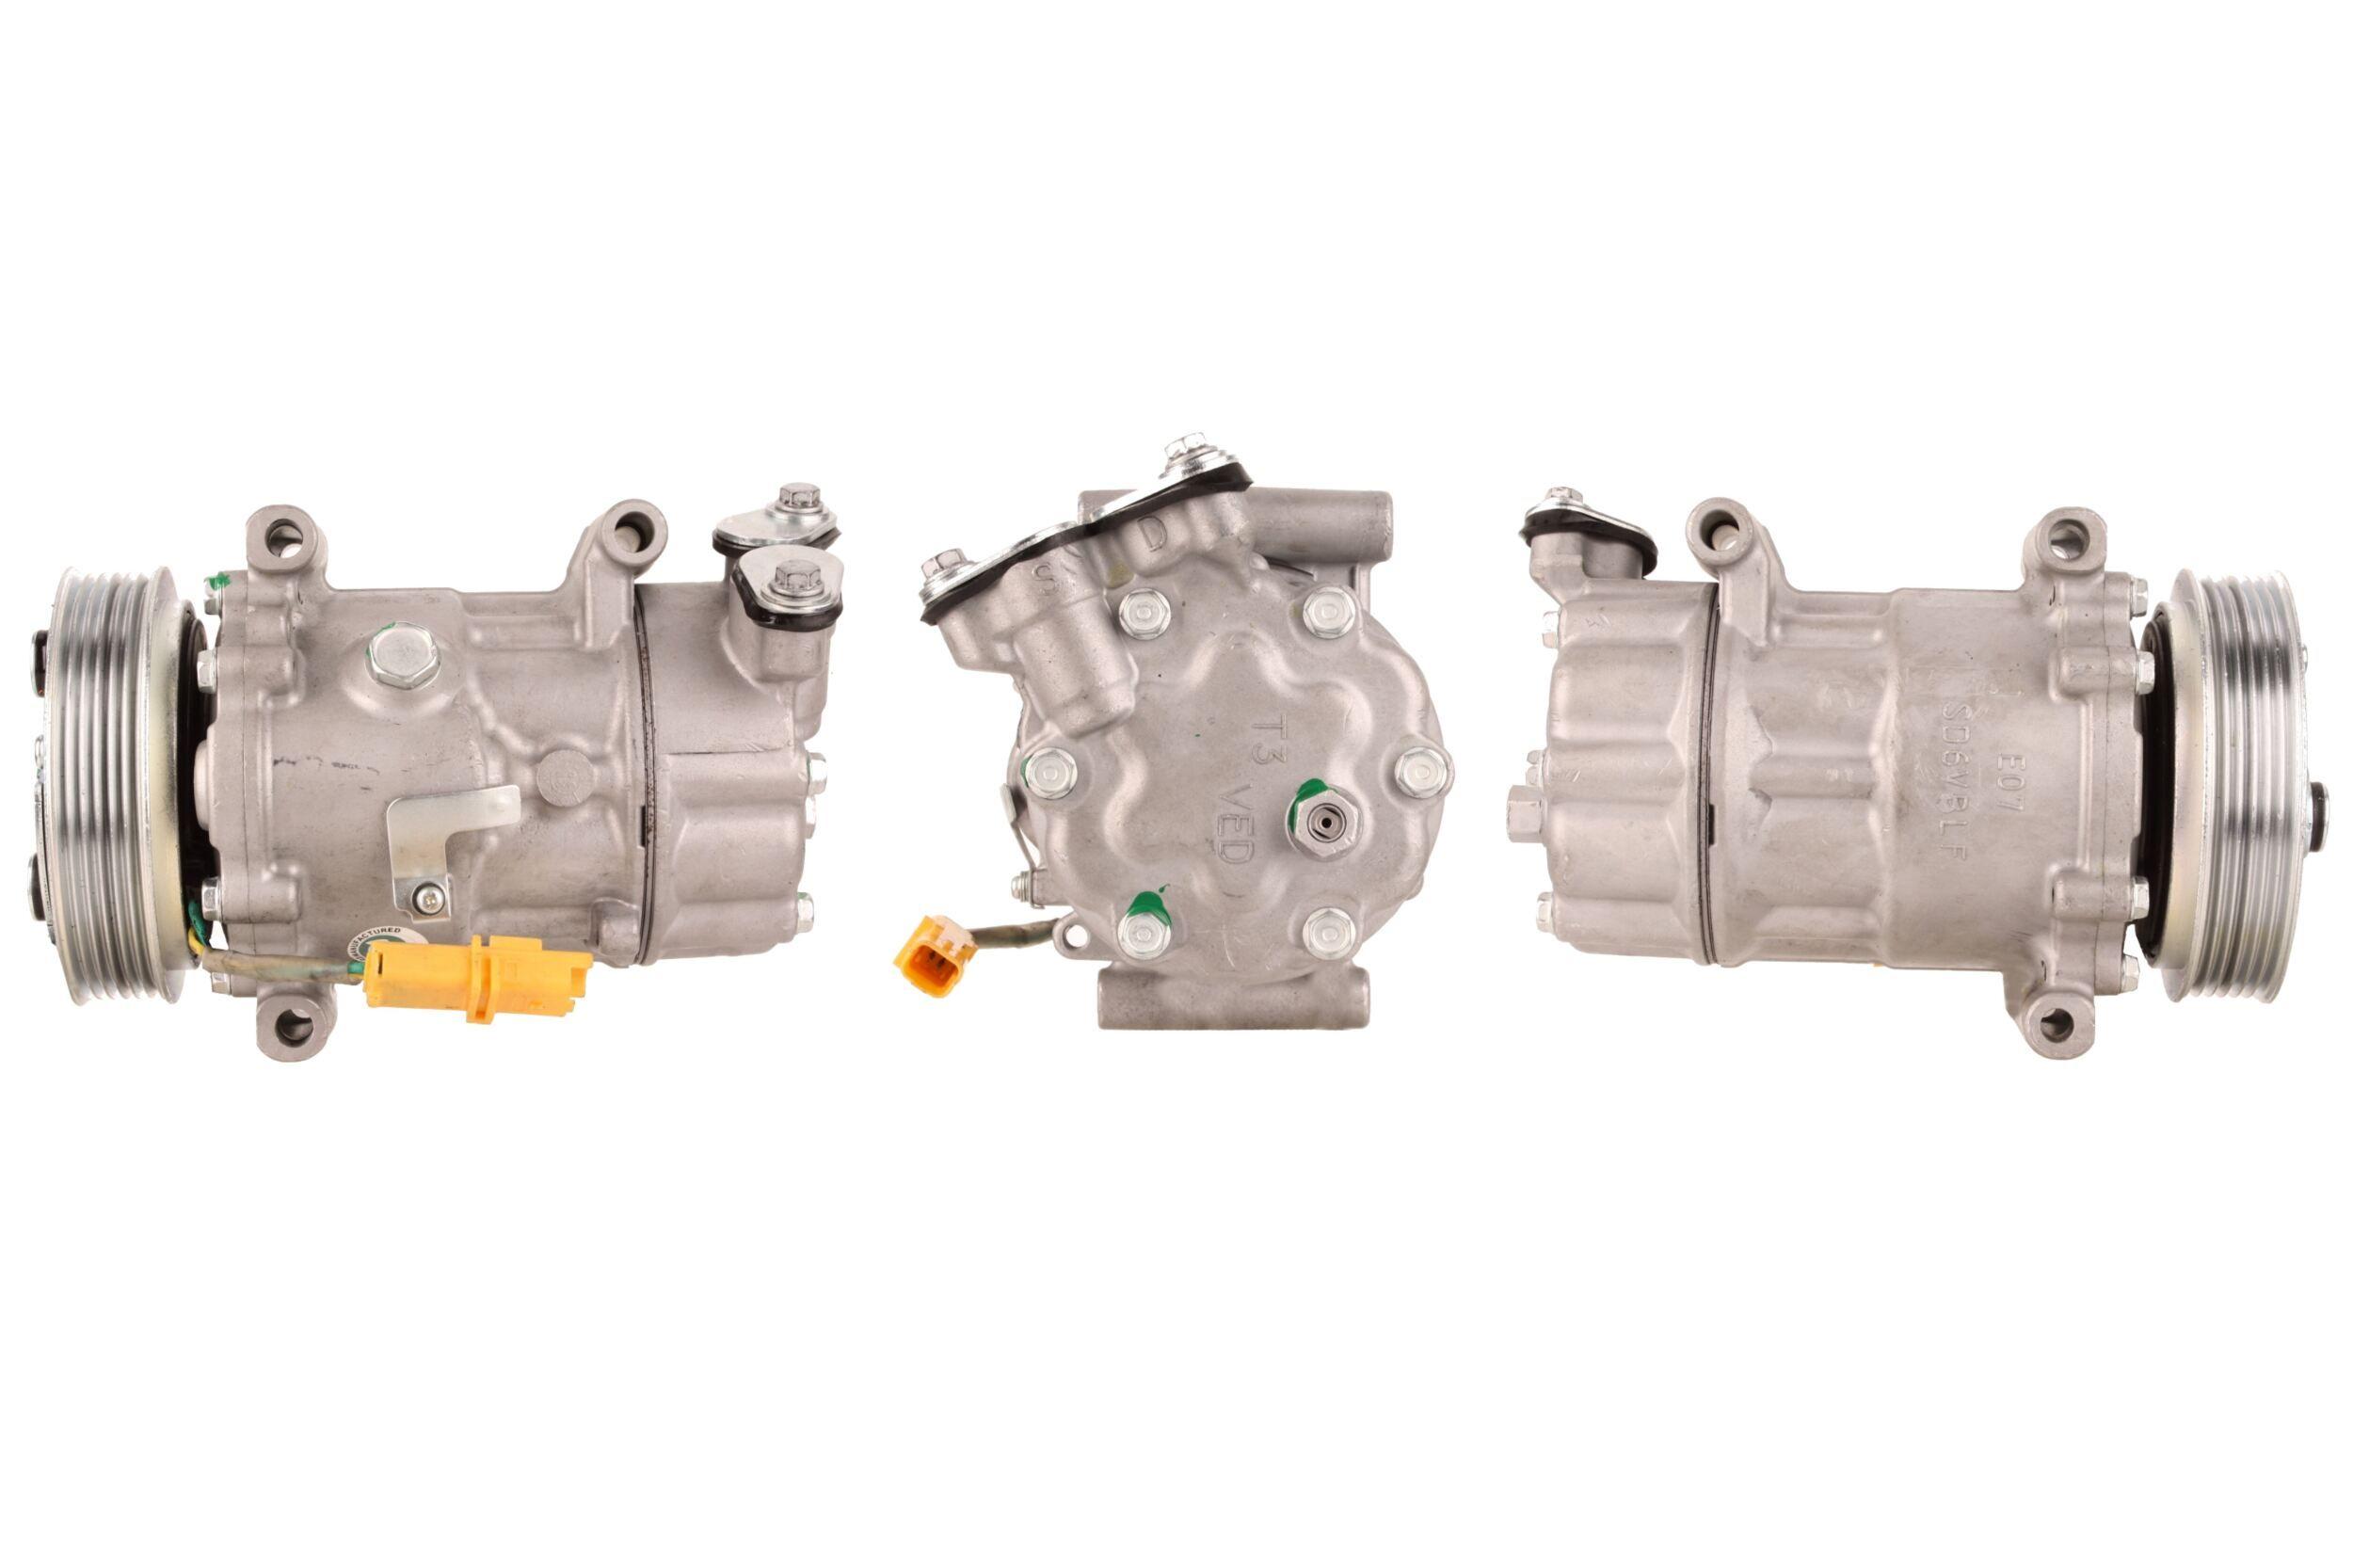 kjøpe Aircondition pumpe 51-0598 når som helst